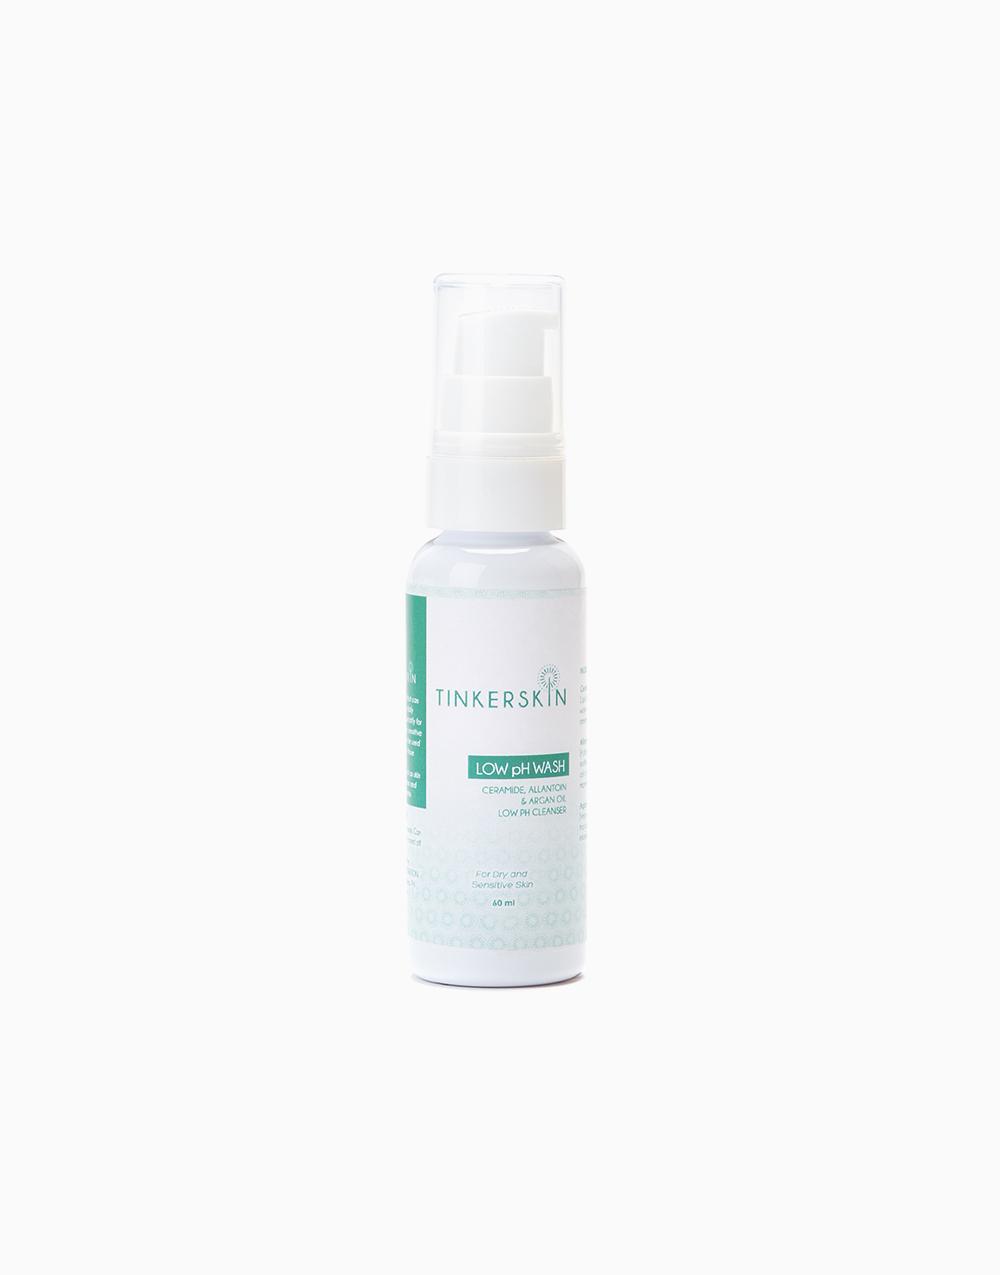 Ceramide + Allantoin + Argan Oil Low pH Wash by Tinkerskin